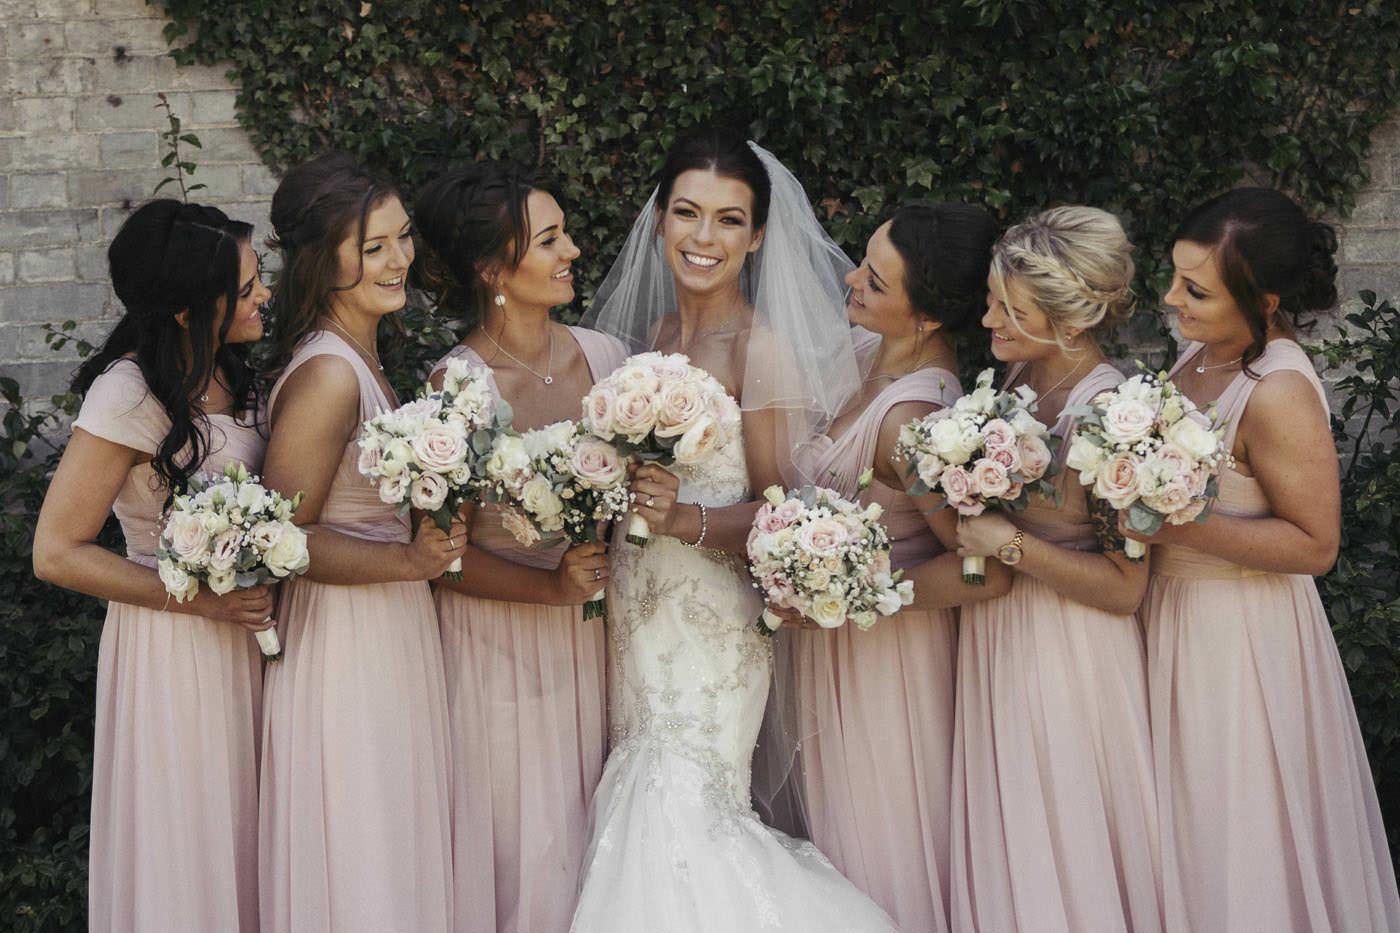 lukeemily foxhills wedding photographer 0067